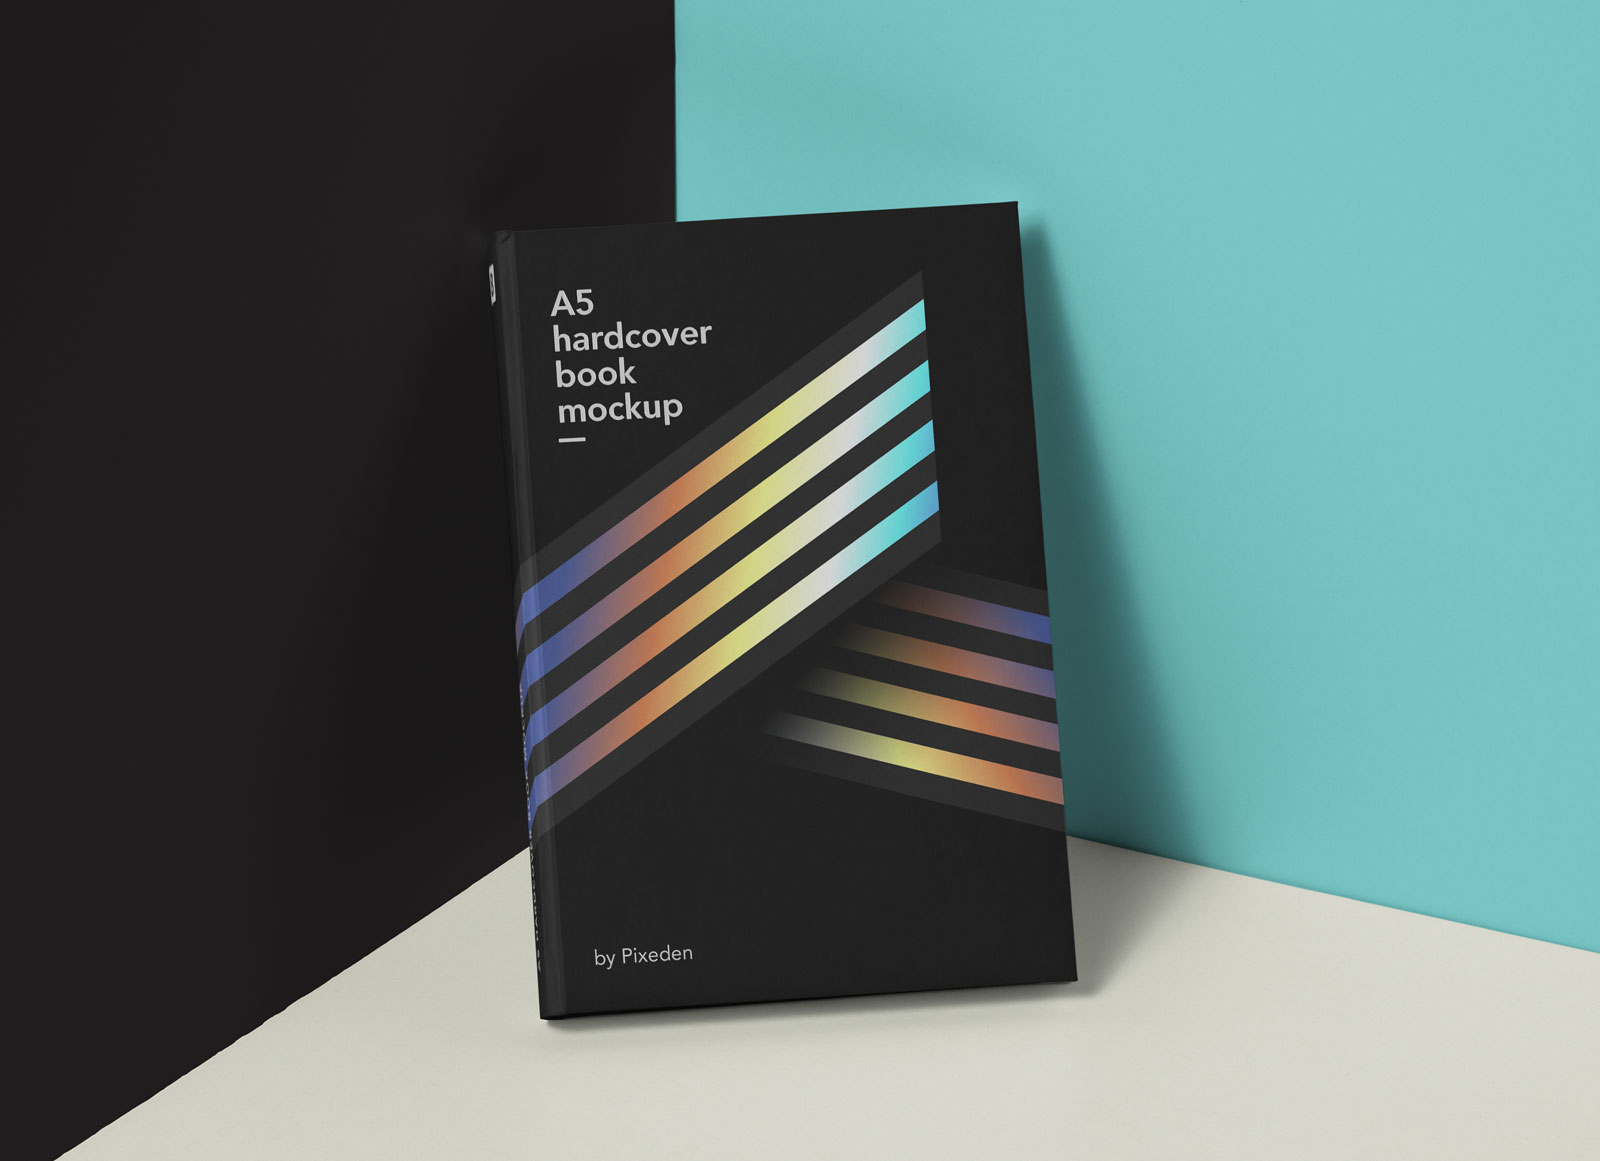 A5-Hardcover-Book-Mockup-PSD